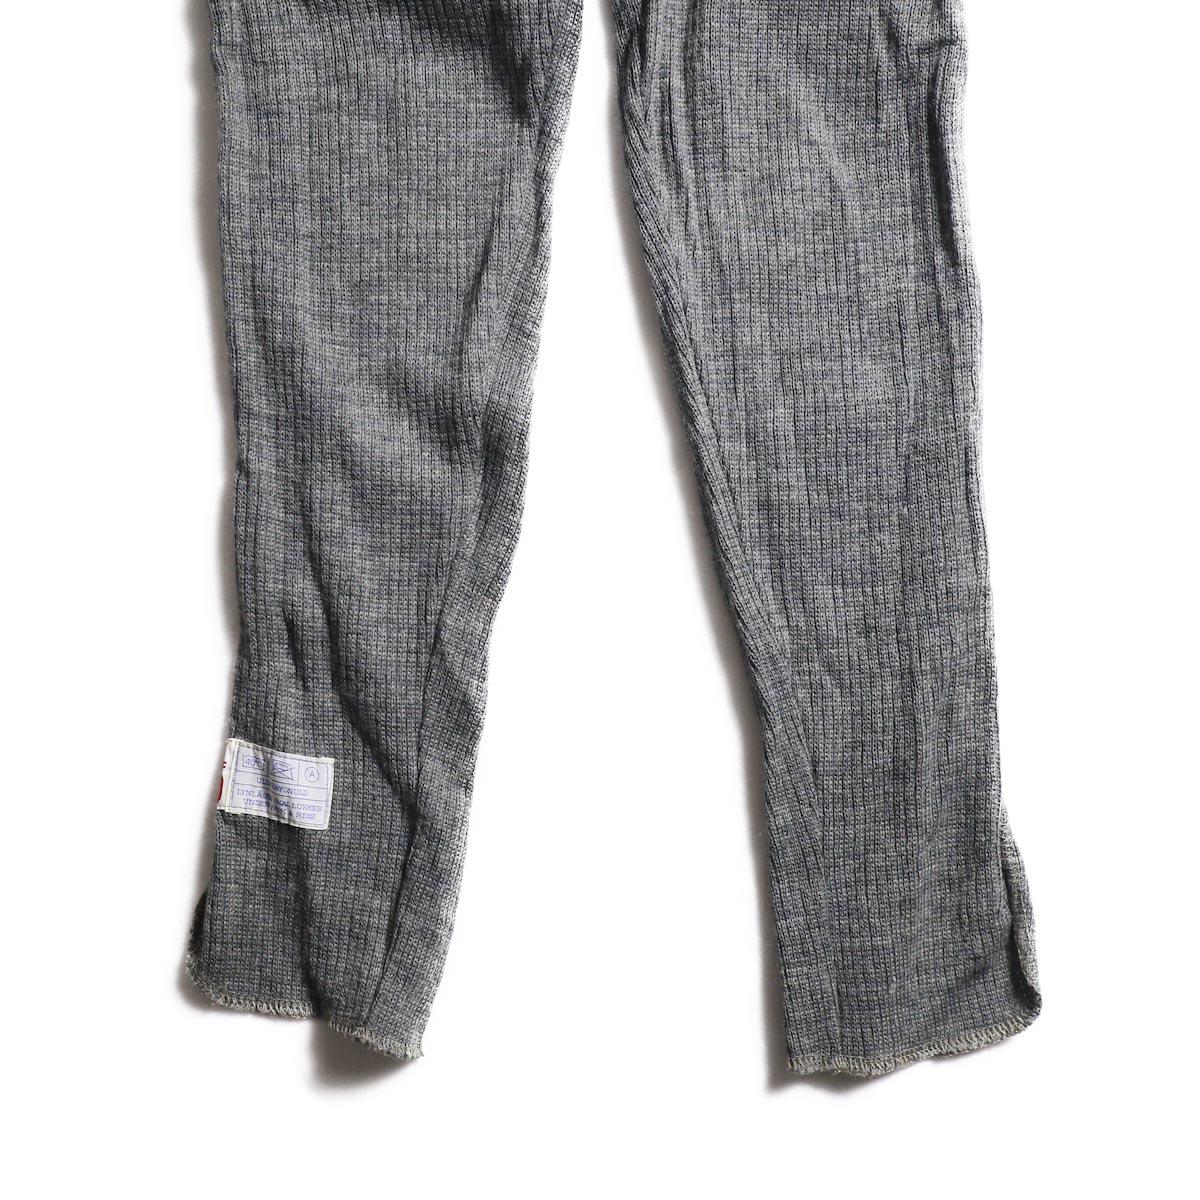 Denmark Military / Side Zip Under Pants (Medium) (B)